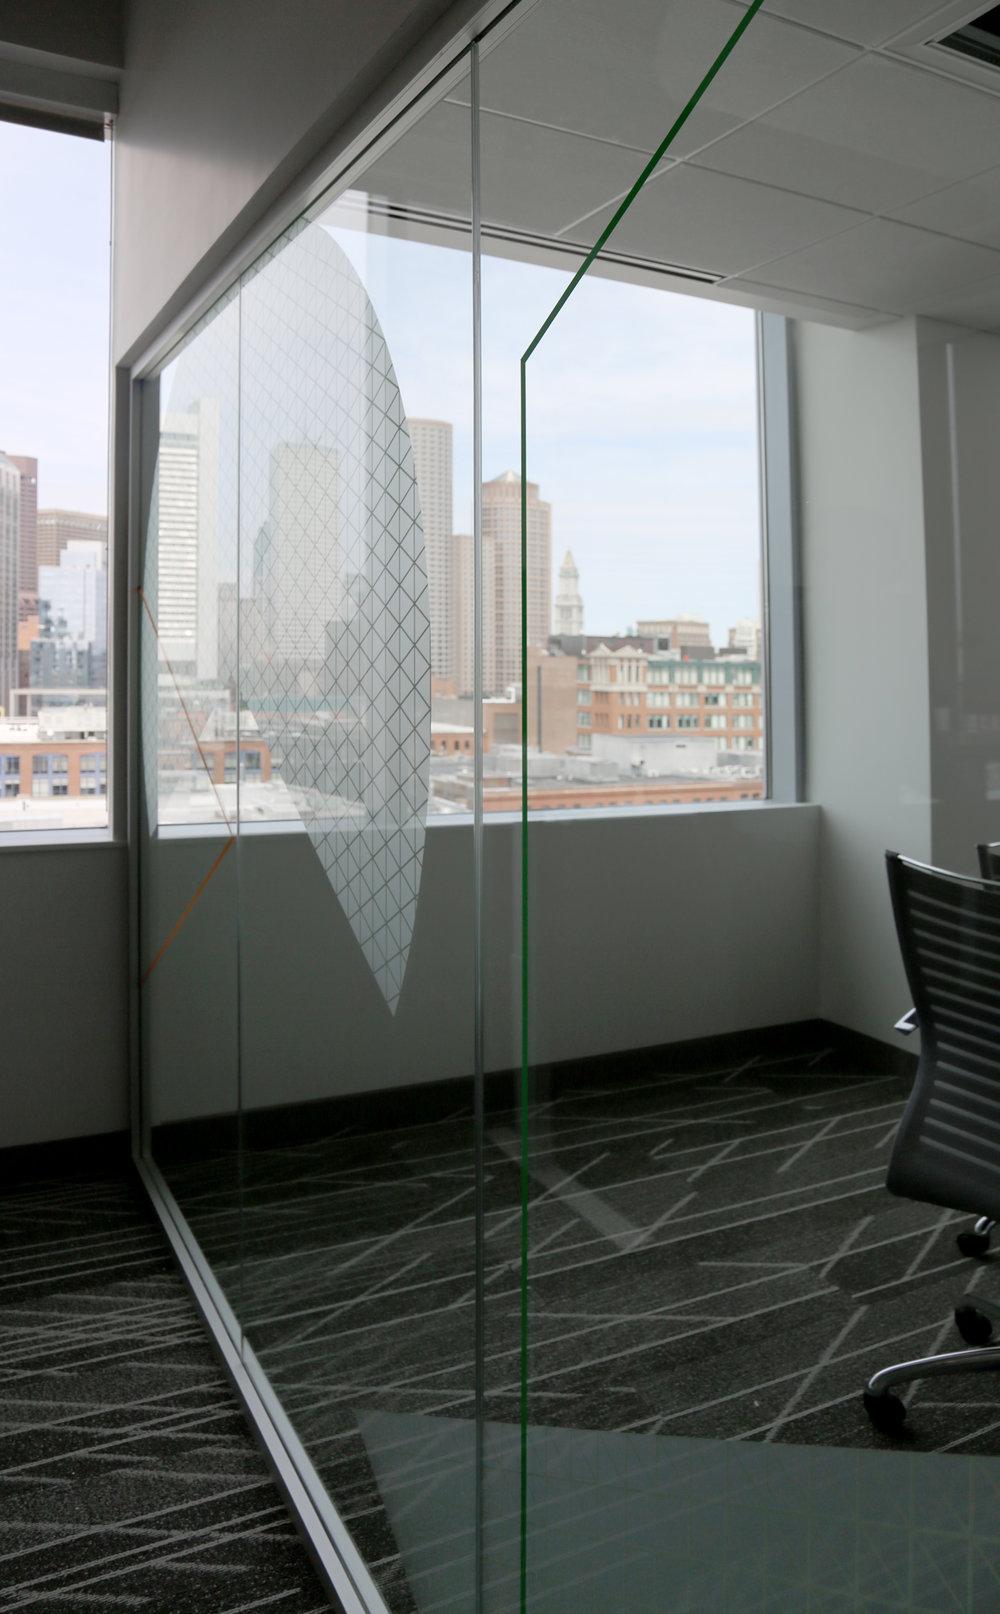 Litespace Conference Glass Butt Glazed Wall - Spaceworks AI.jpg